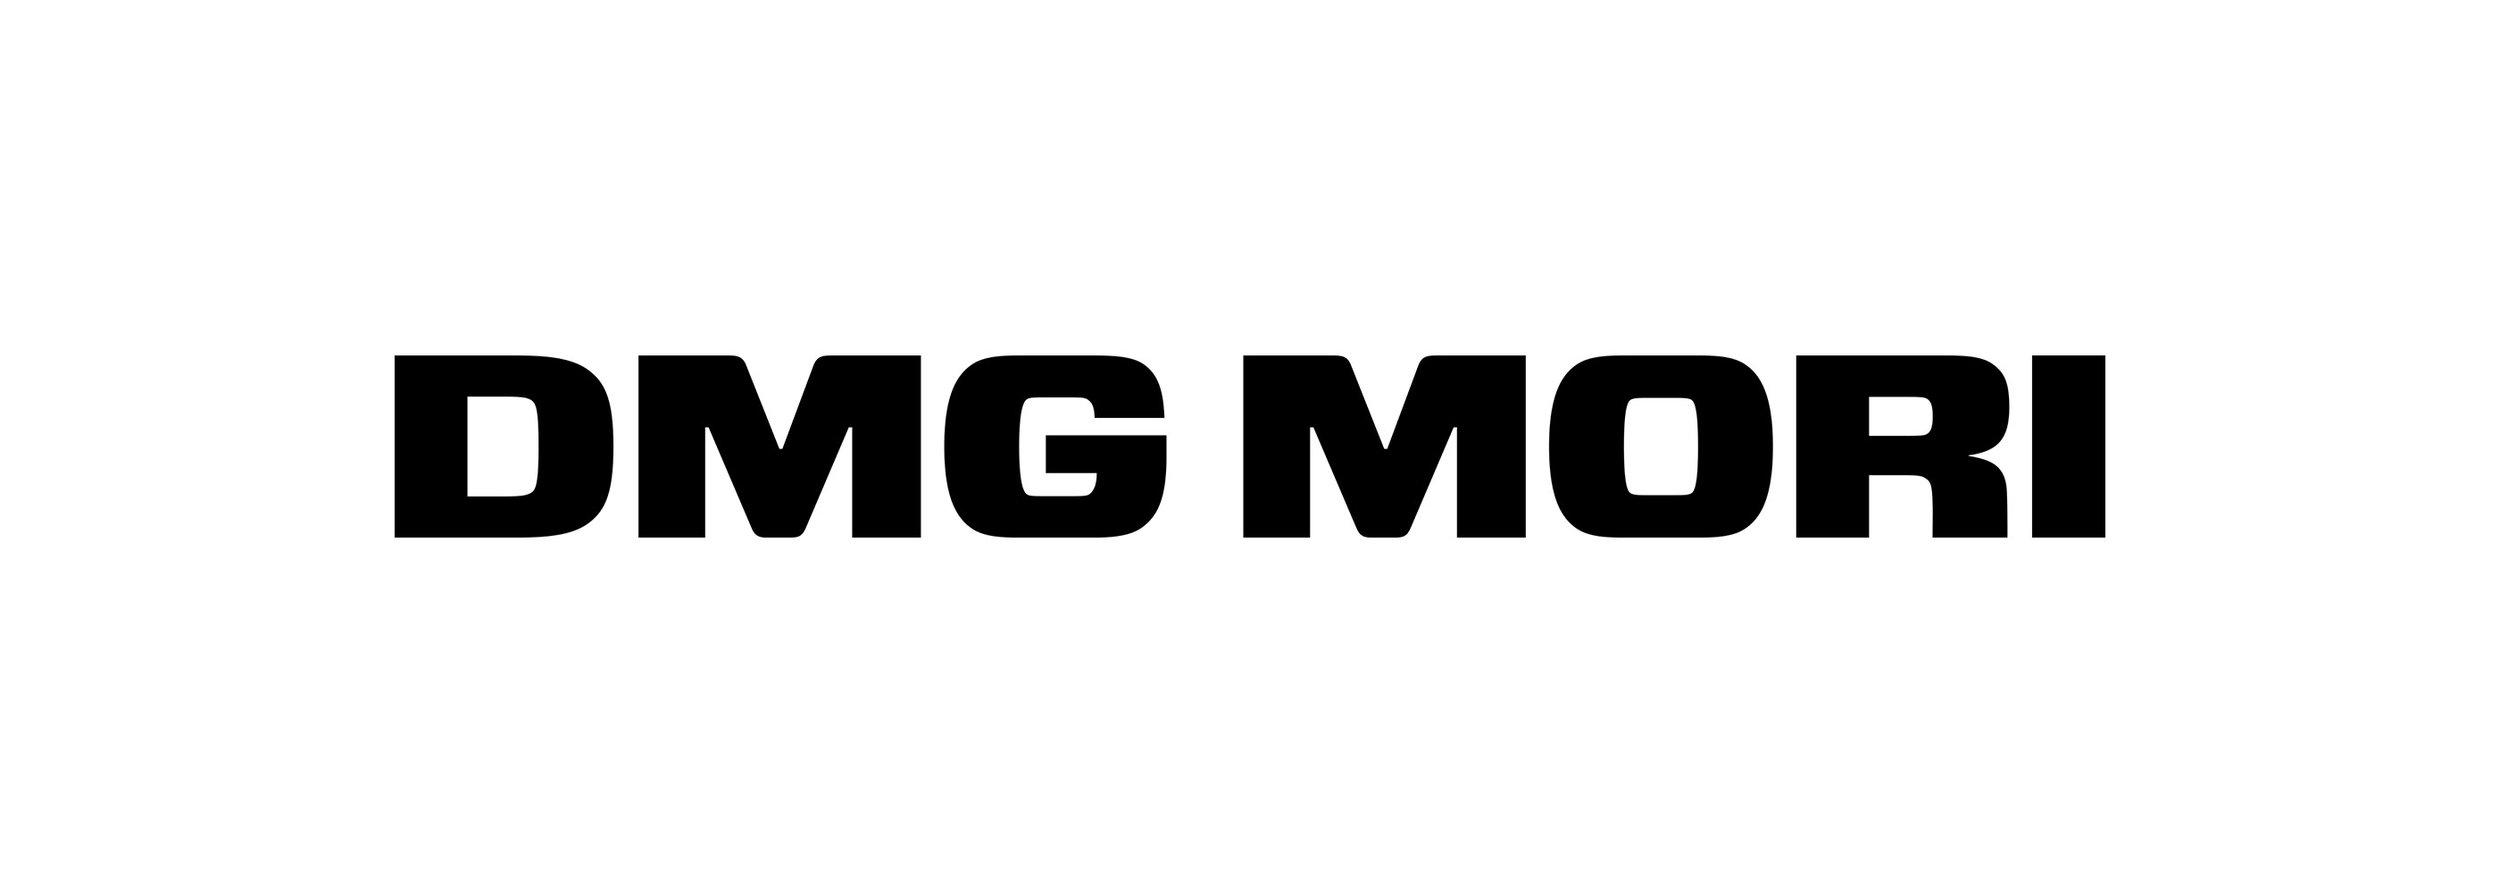 DMG Mori.jpg